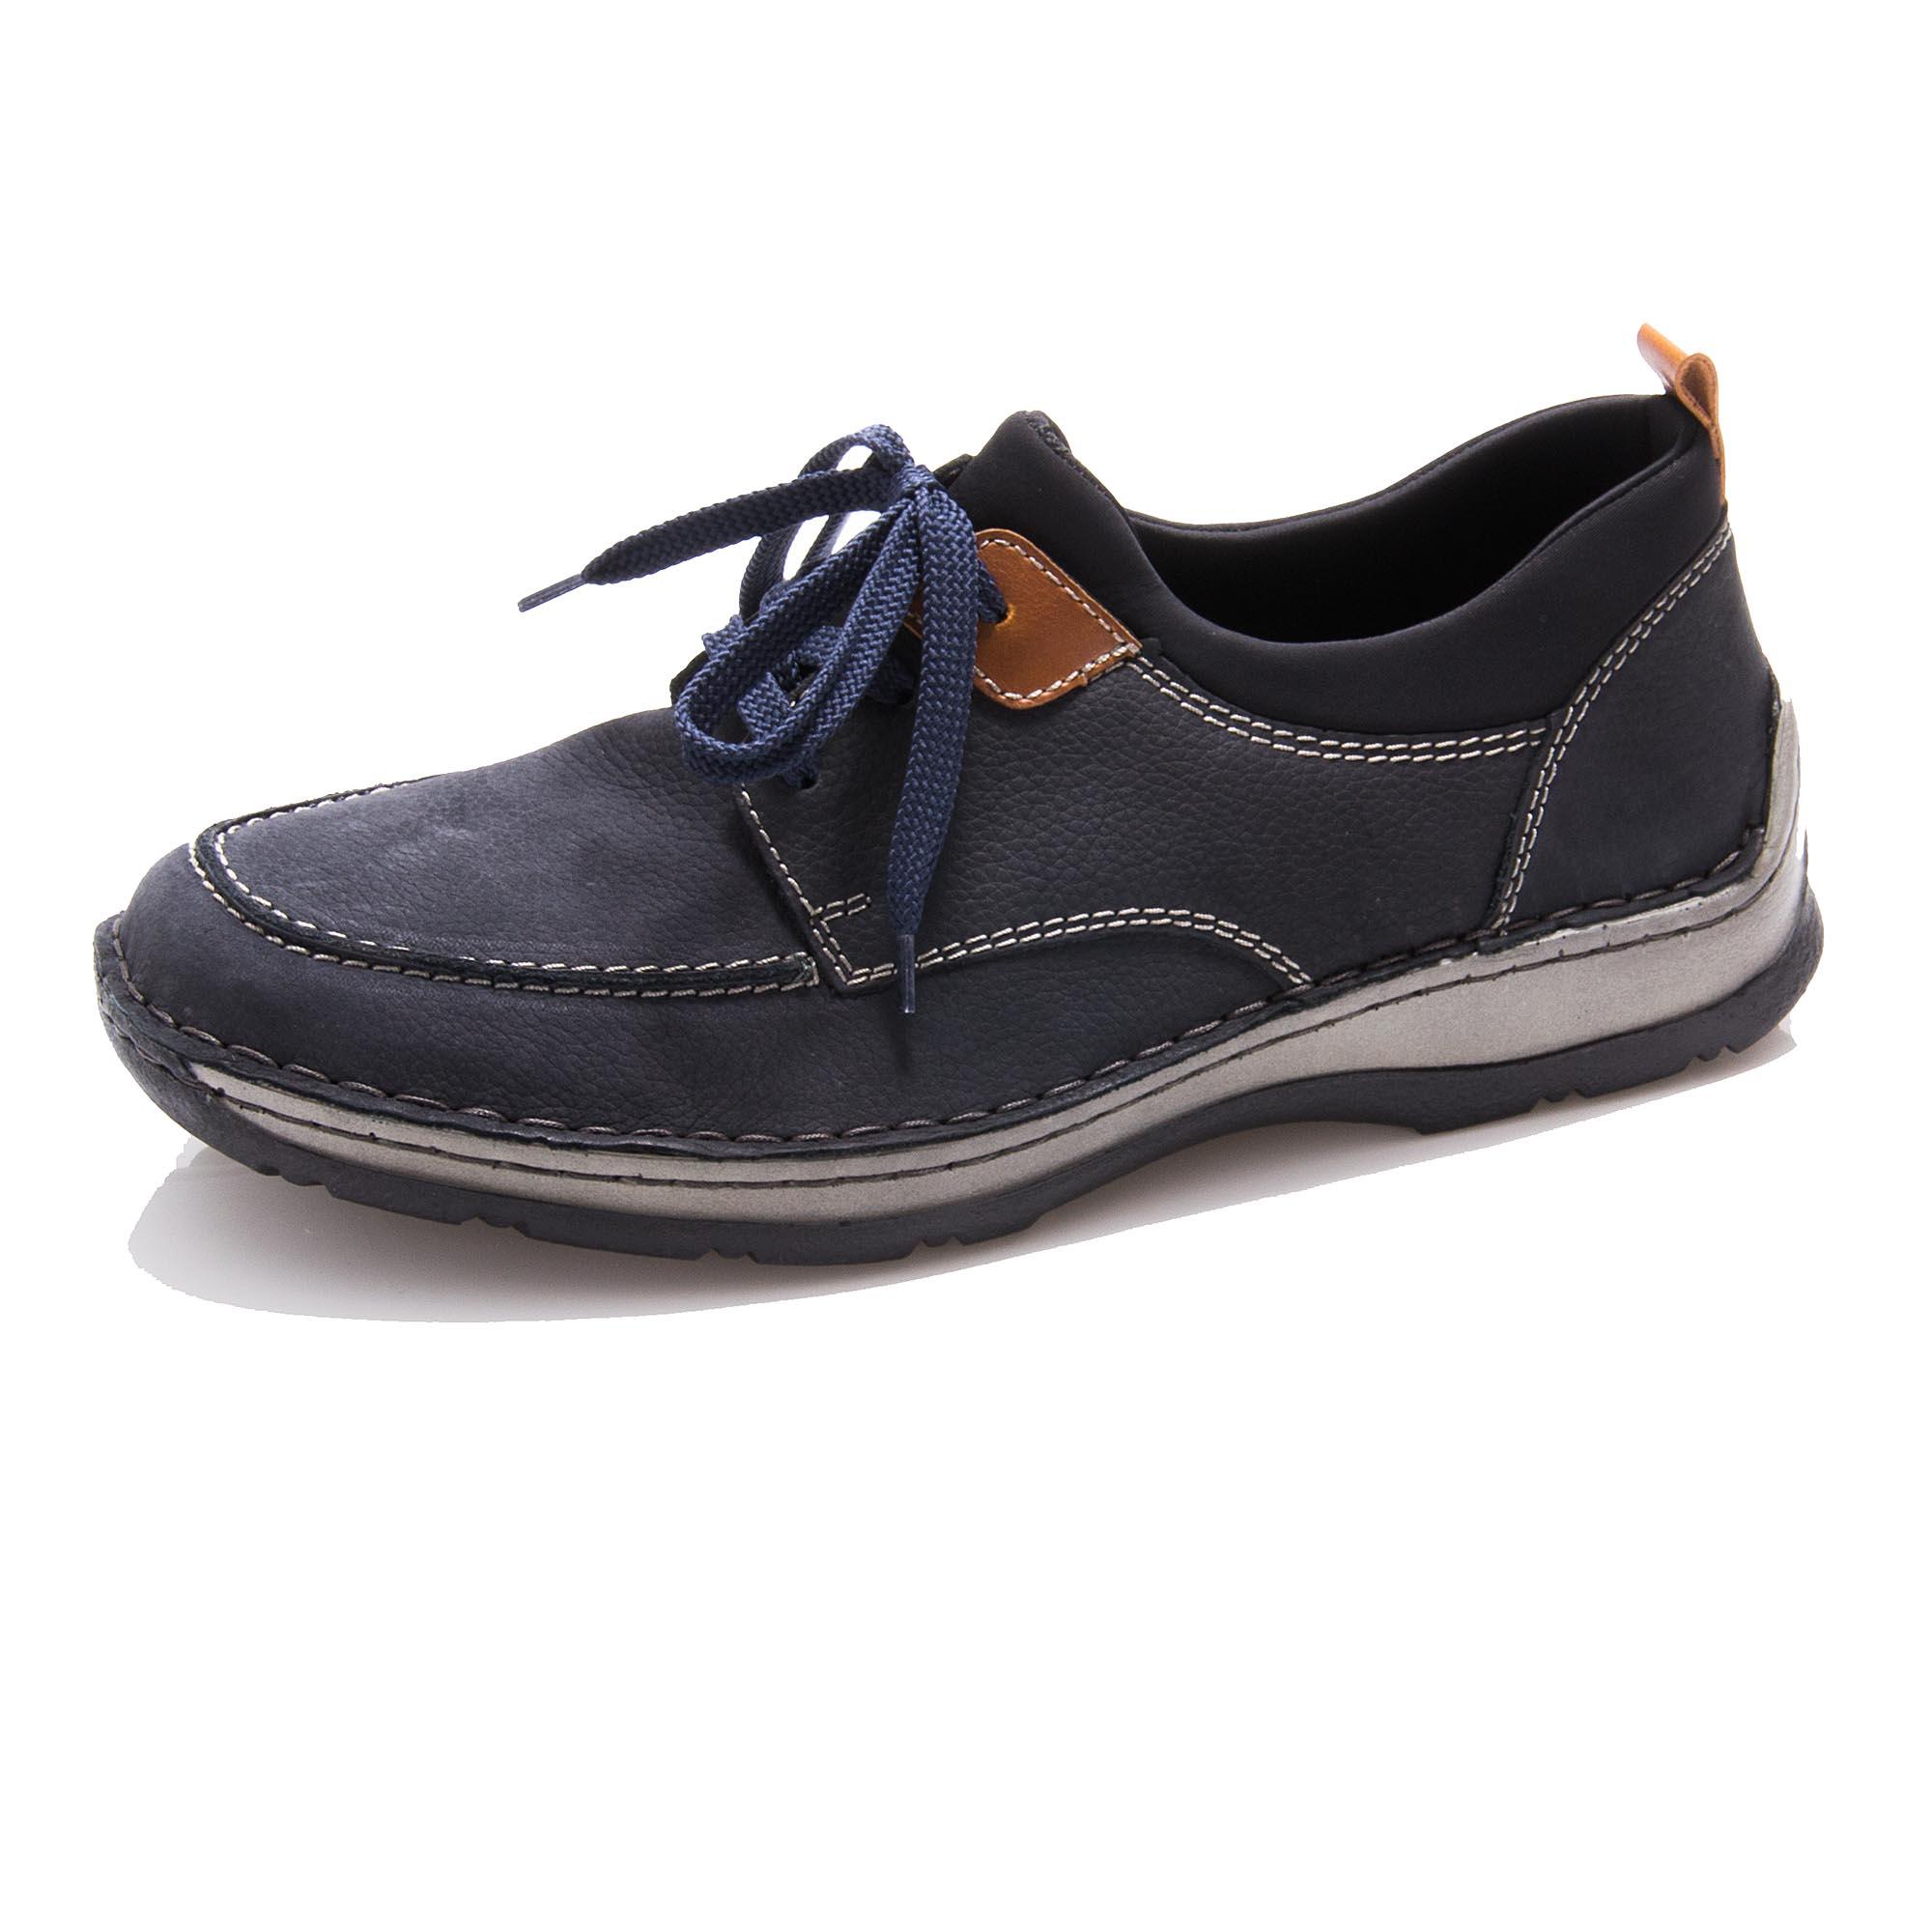 97191c2018 detail Pánská obuv RIEKER 05353-14 BLAU F S 9